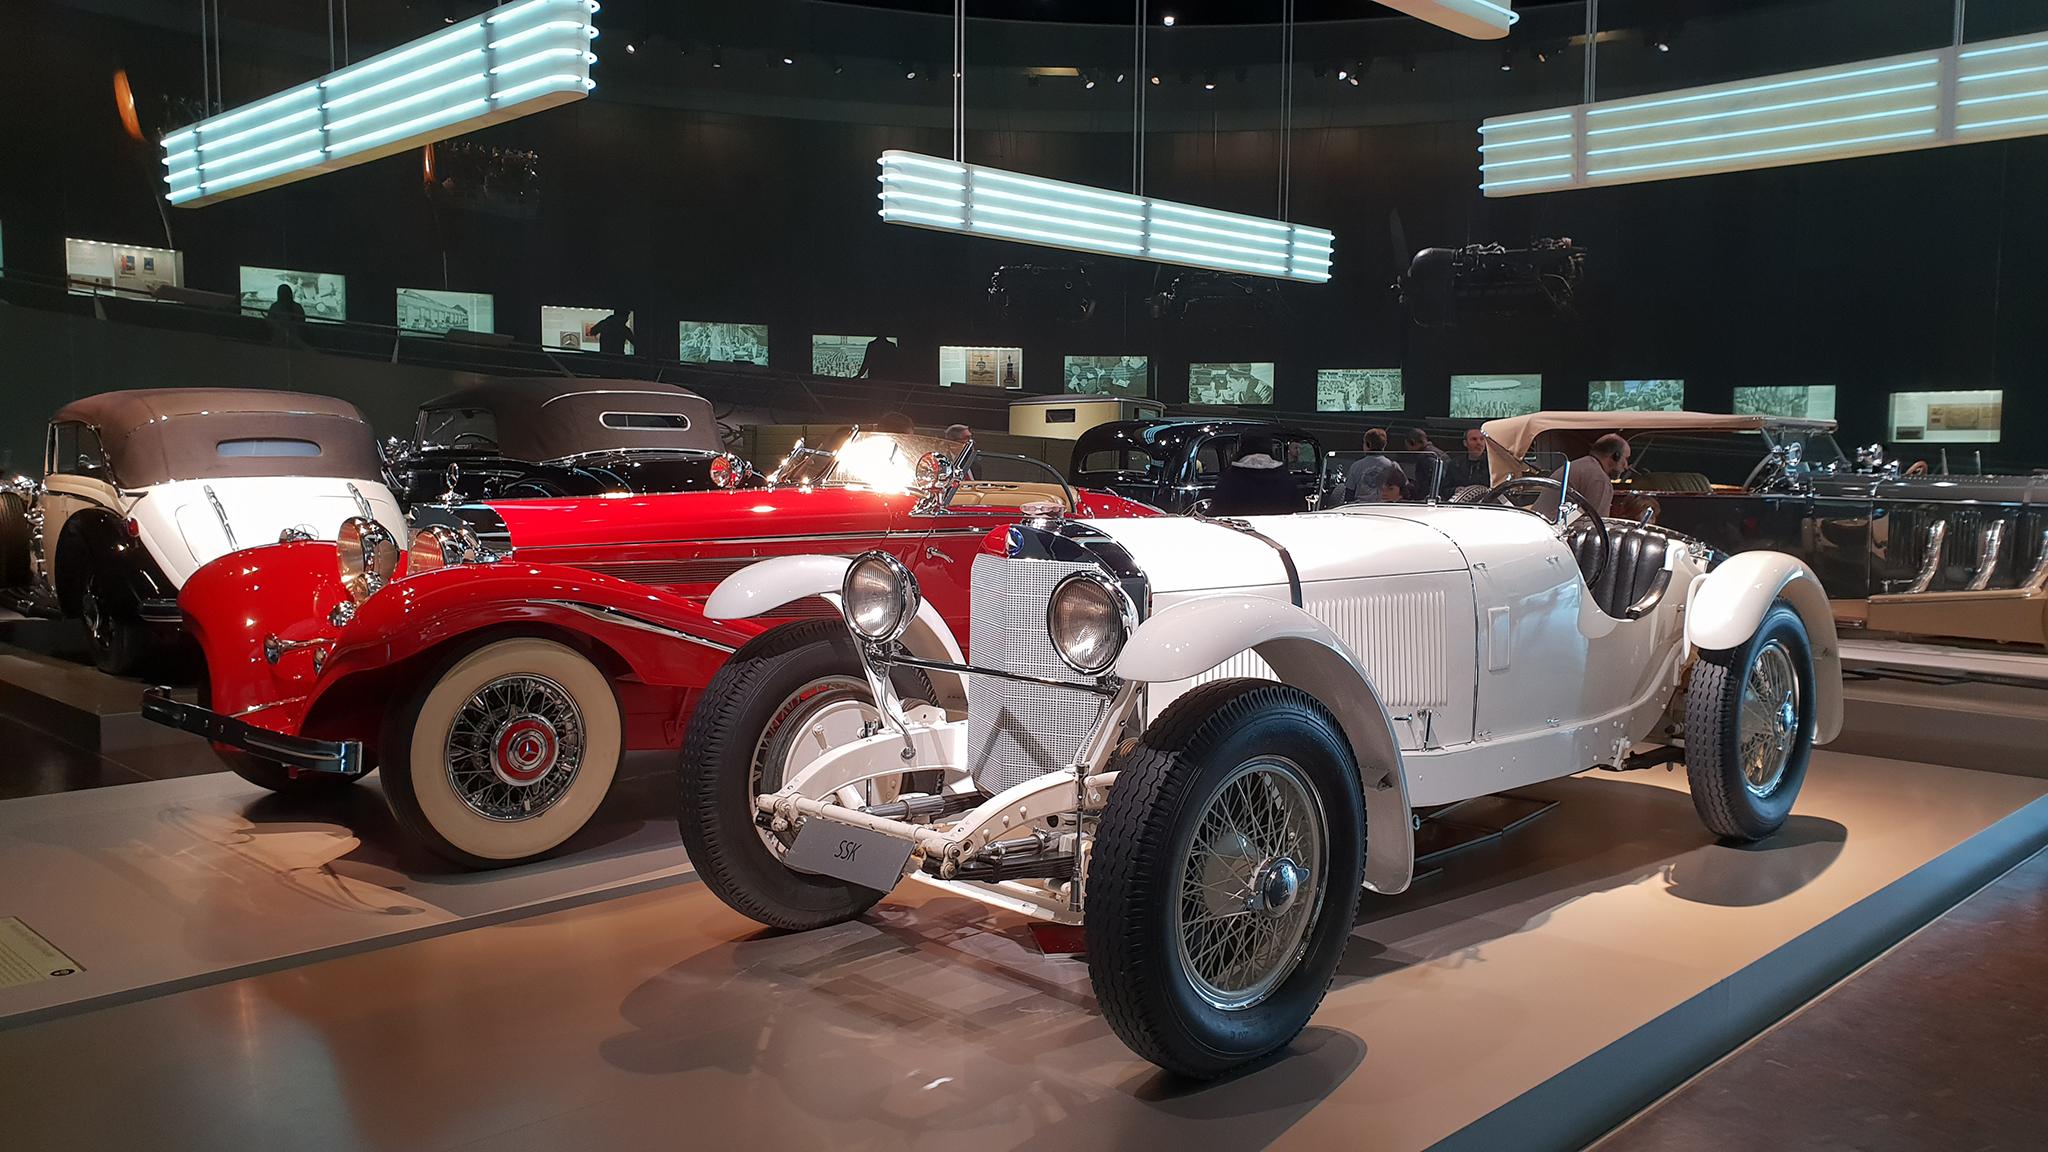 S9-Mercedes-Benz Museum-tinhte-80.jpg